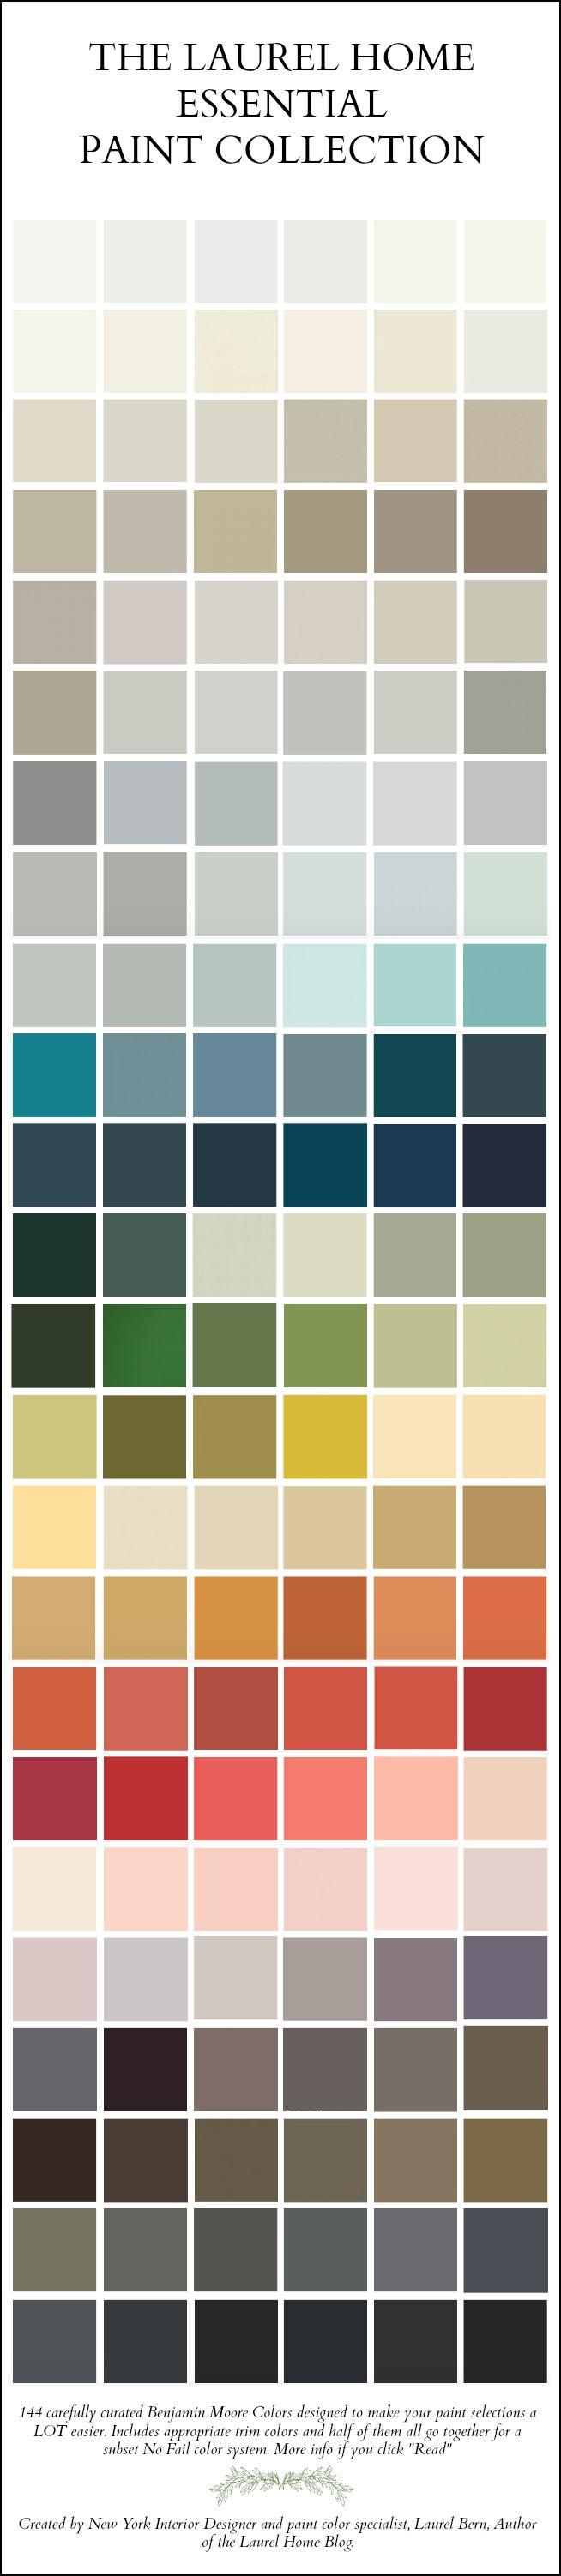 Paint colors that go together - 17 Best Ideas About Coordinating Paint Colors On Pinterest House Color Schemes Interior Color Schemes And Home Color Schemes